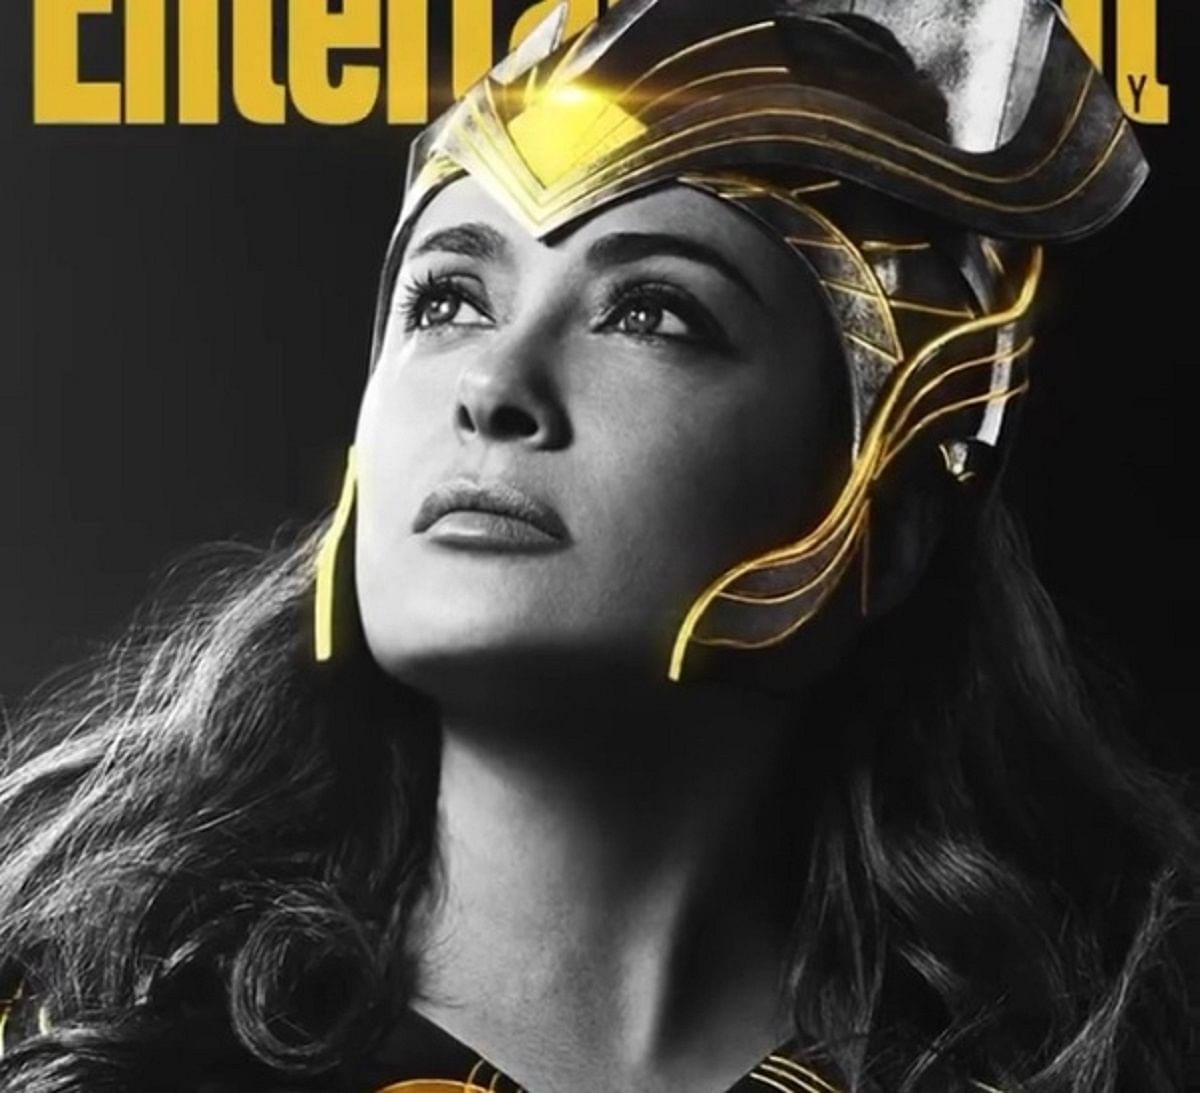 Salma Hayek: Very humbling landing superhero role in my 50s